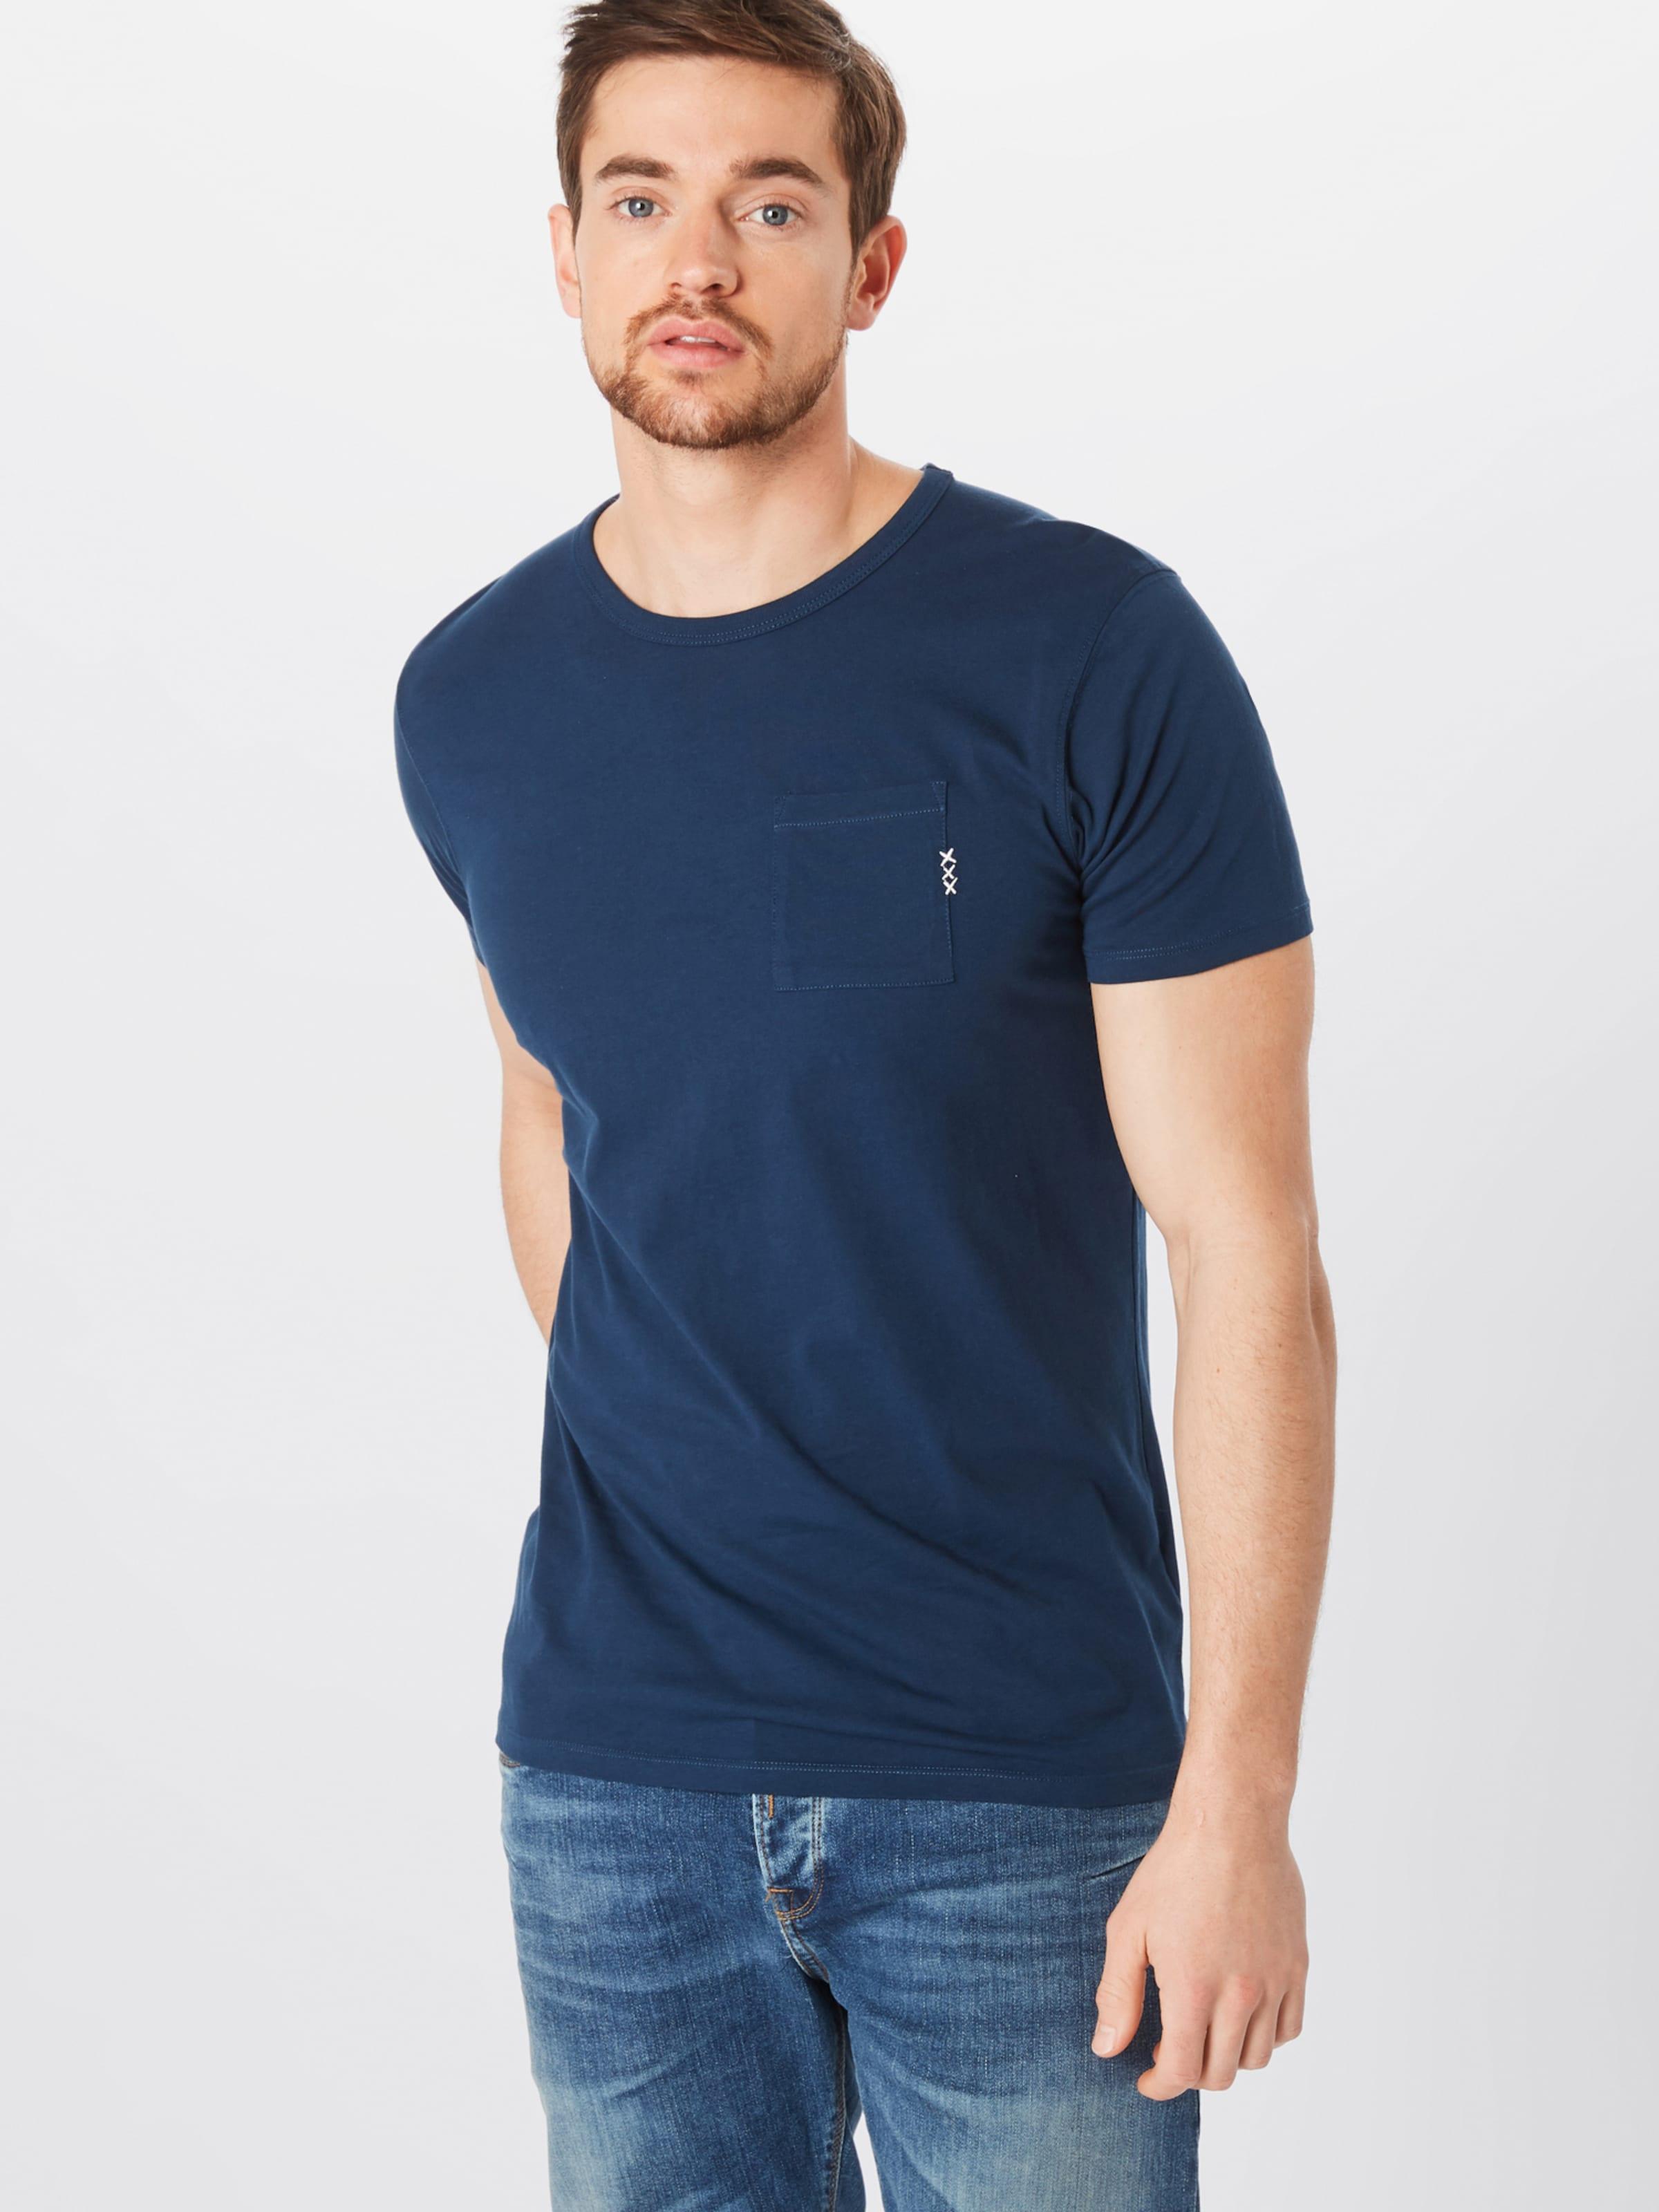 Colours Blauw En Tee Embro' Bleu Soda With Pocket 'ams 1 In Scotchamp; Foncé T Xxx shirt b76vYyfg